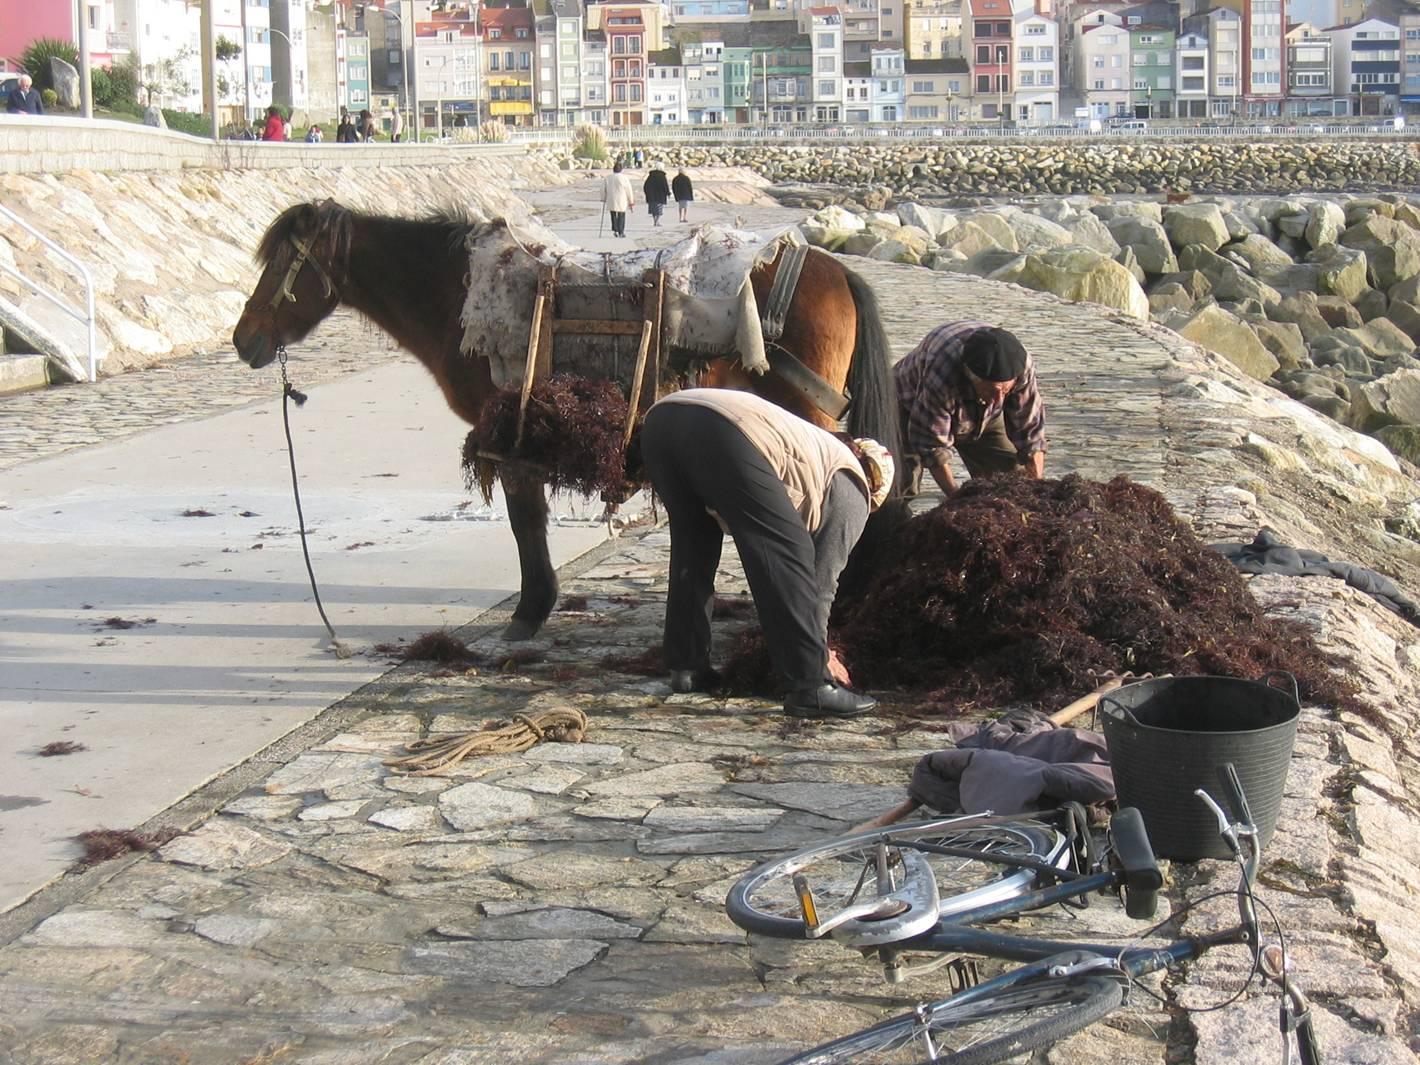 Foto playa Carreiro. Recogiendo algas en La Guardia (Pontevedra)